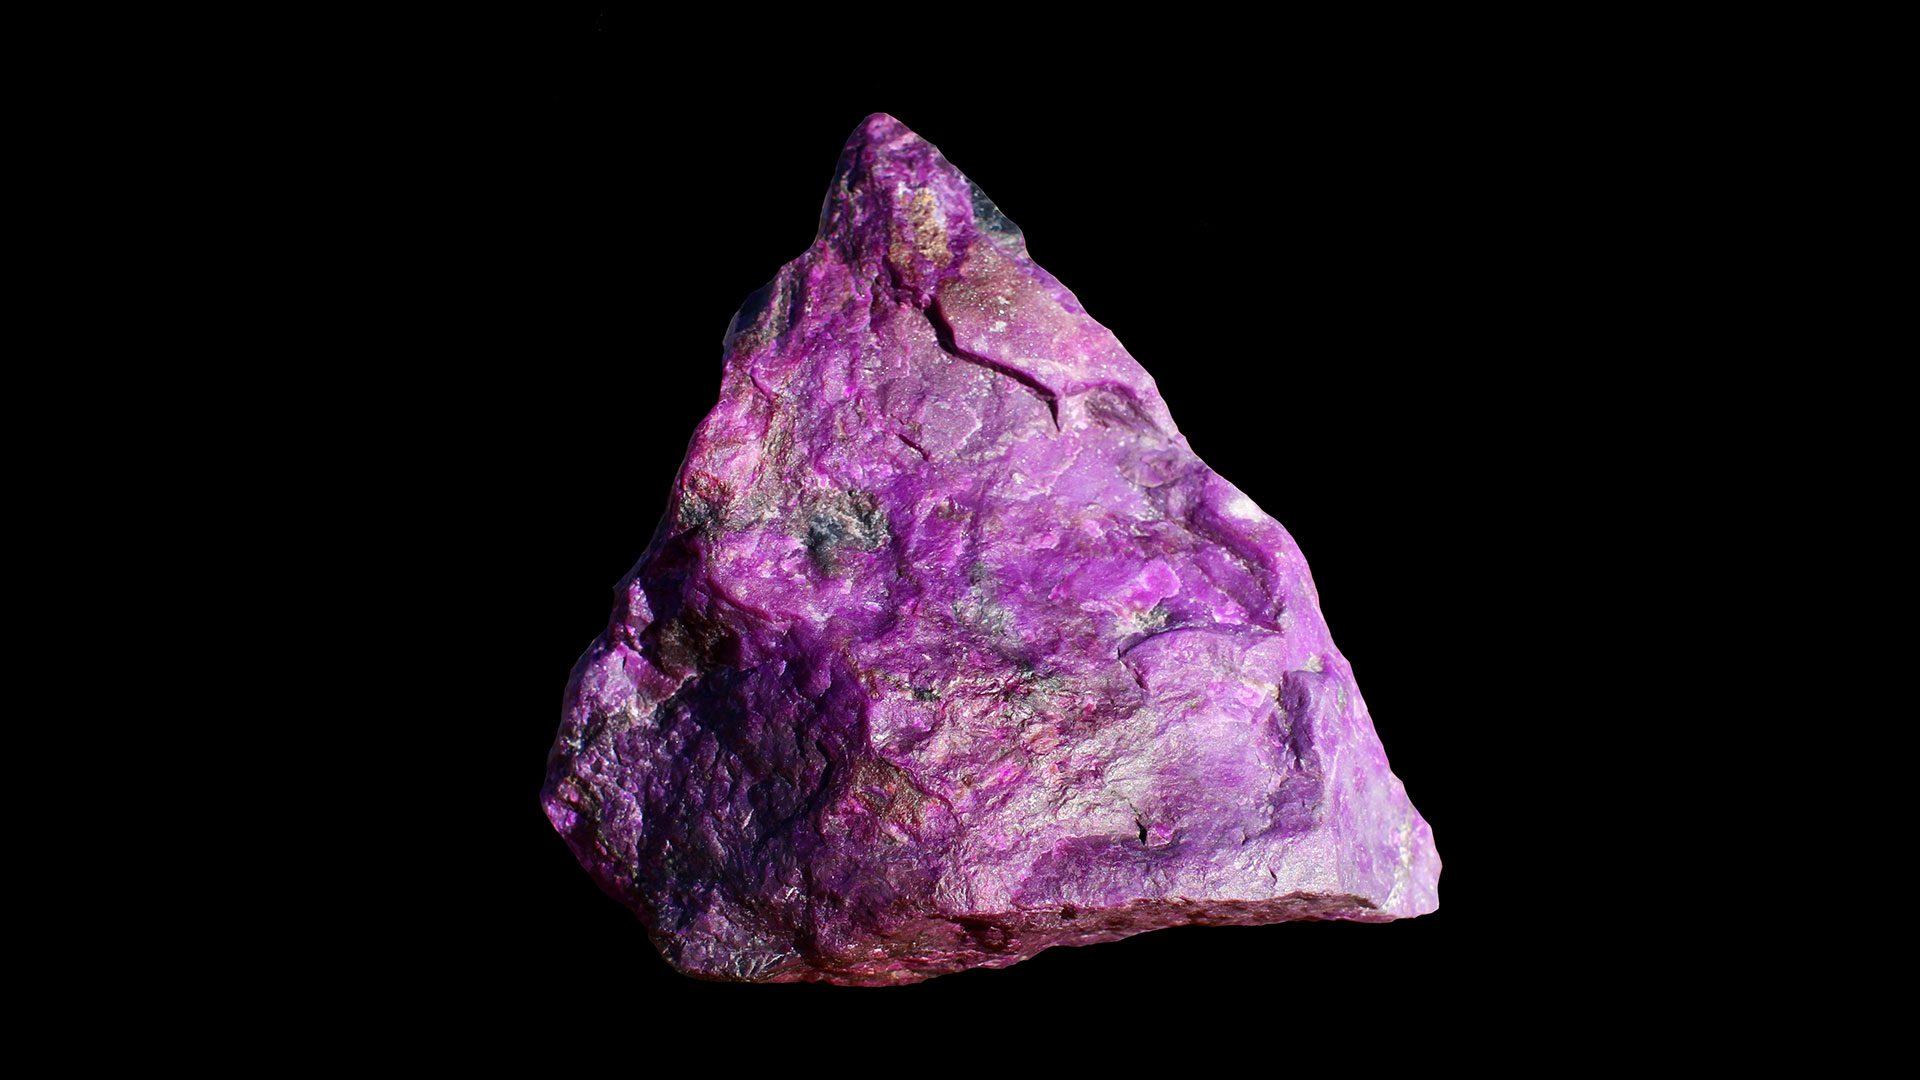 Sugilite Crystal Specimen - Mineral Specimen - Original Photo by TIS0421